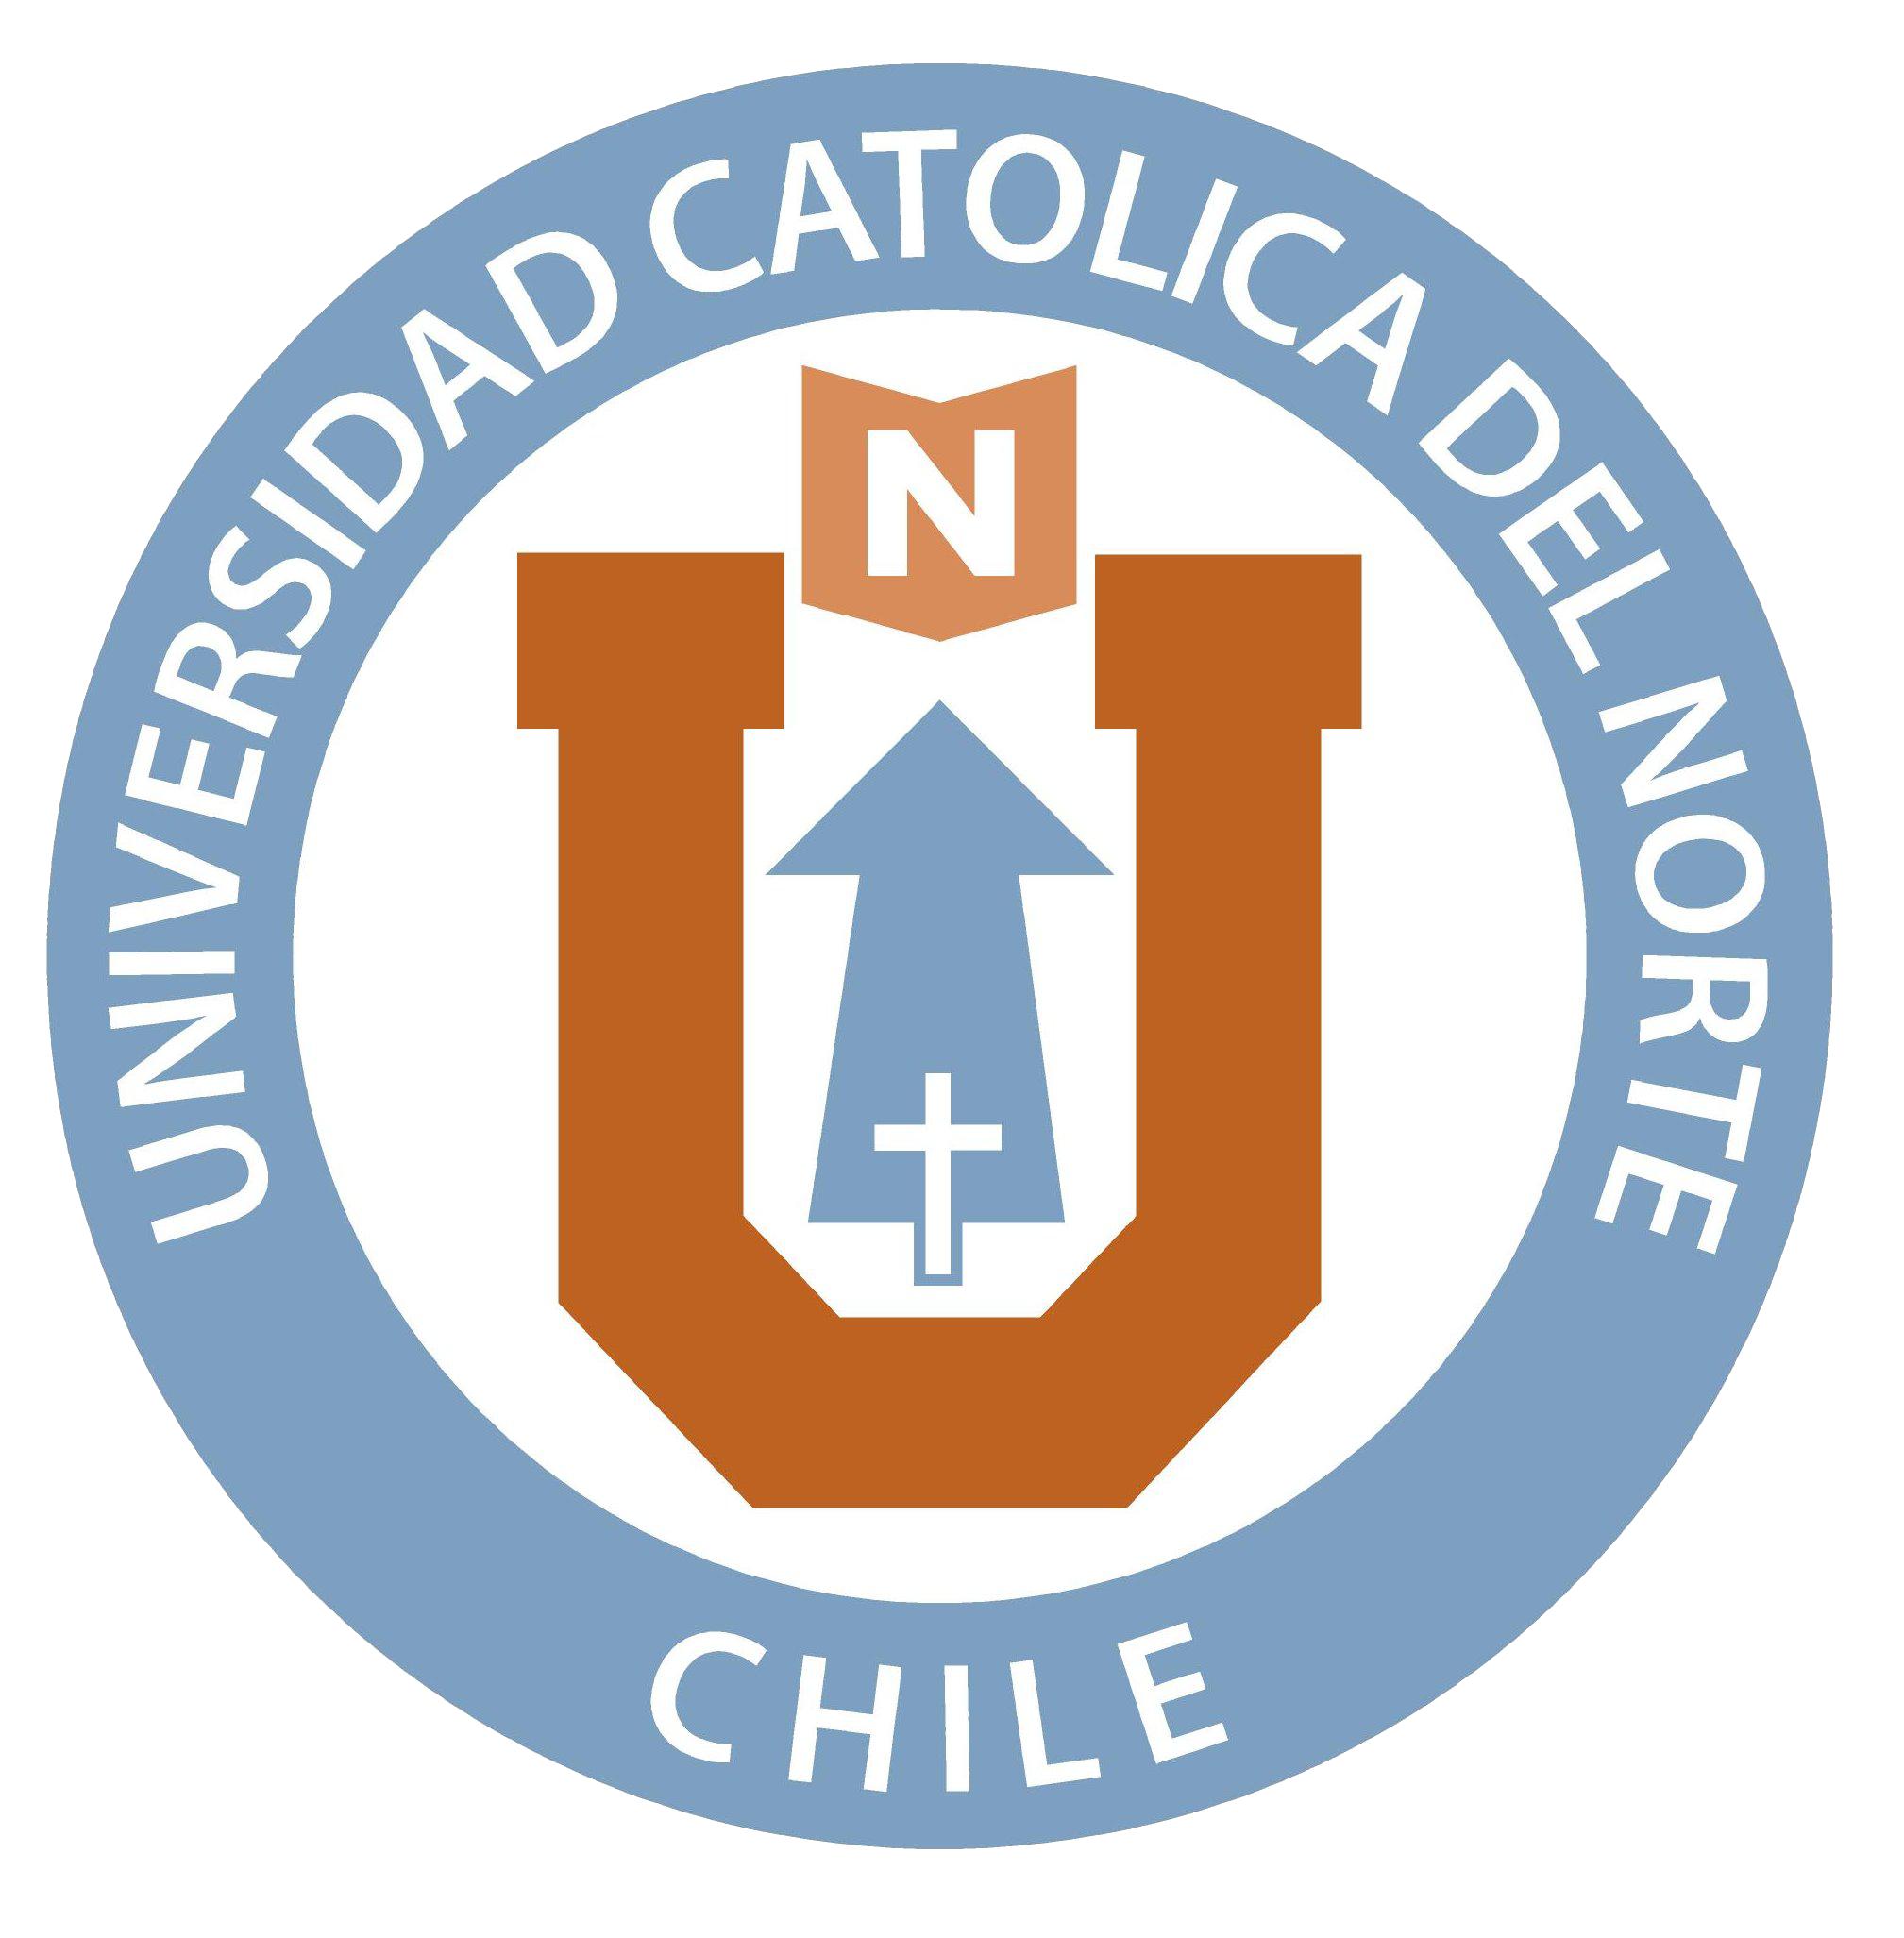 Universidad-Católica-del-Norte